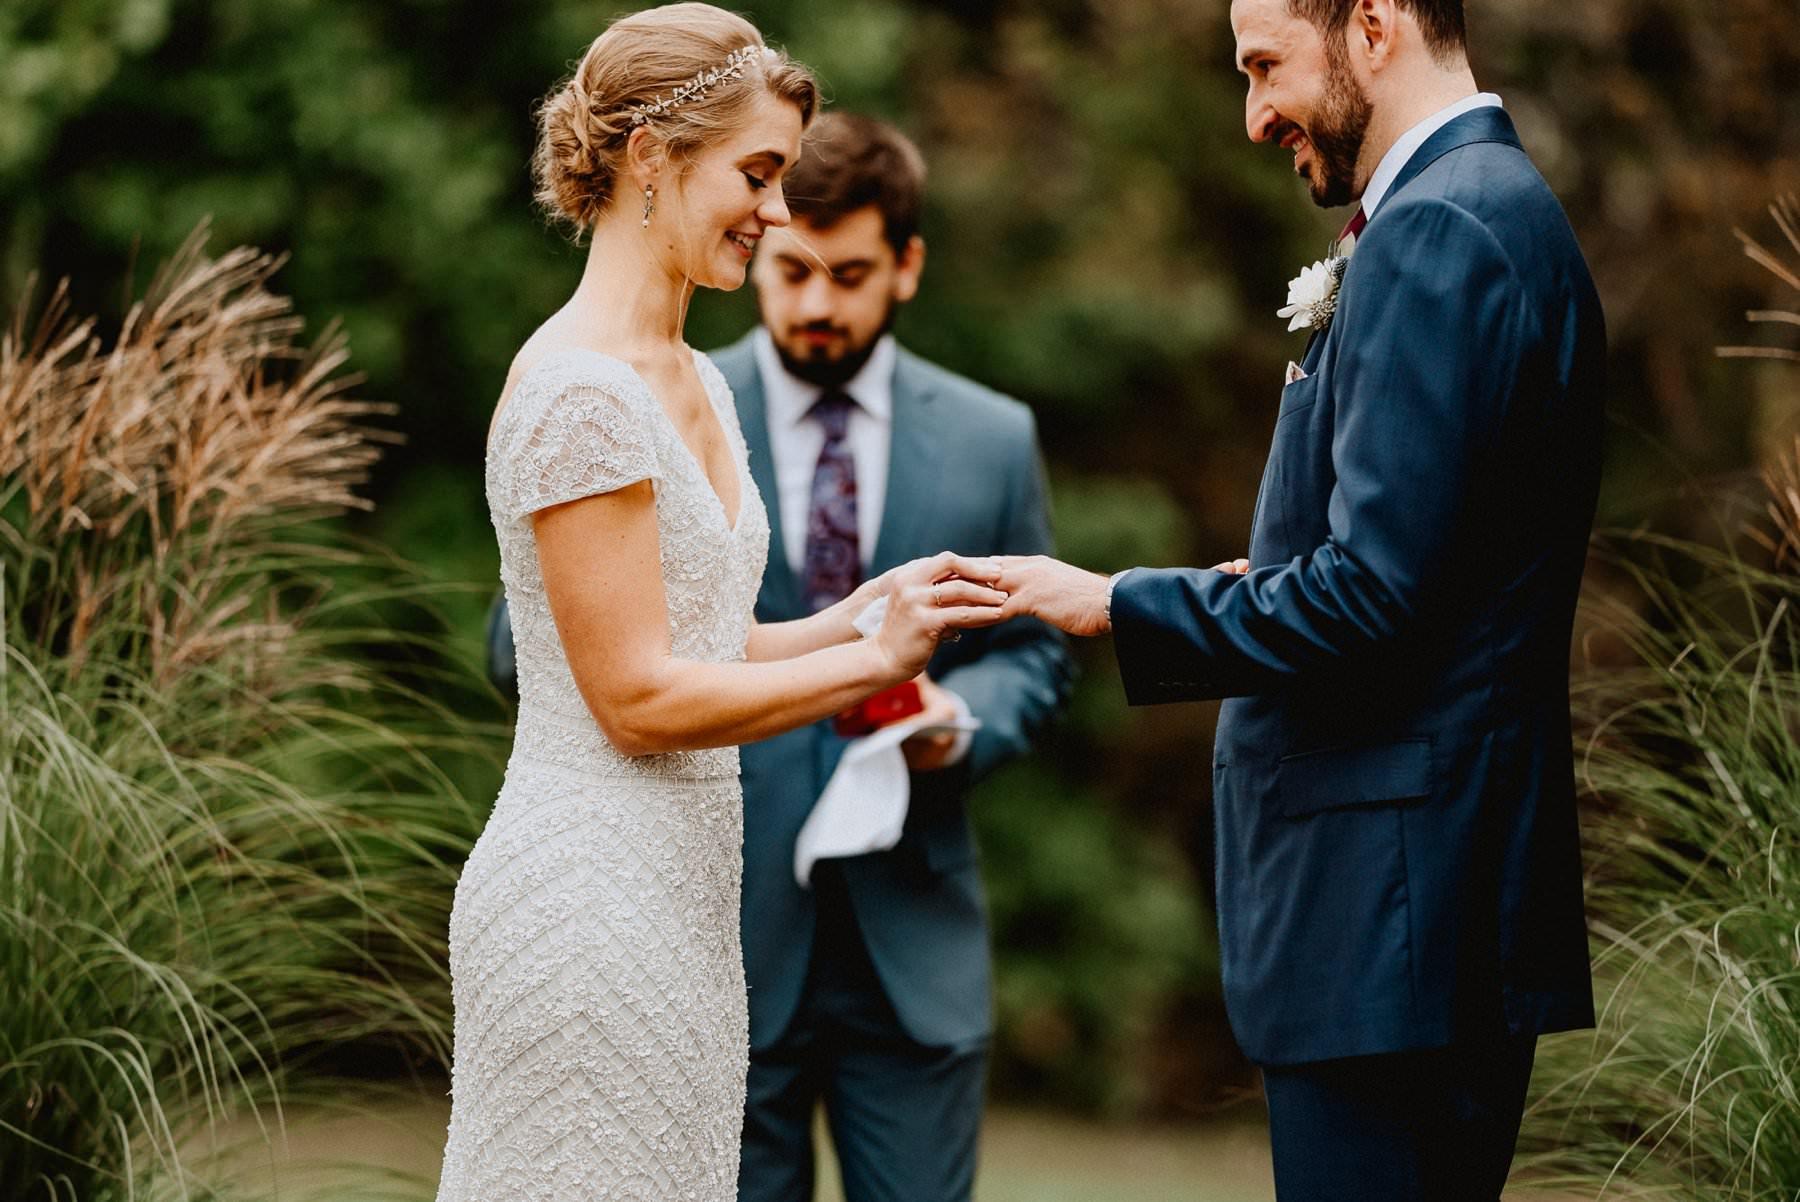 John_James_Audubon_Center_wedding-51.jpg